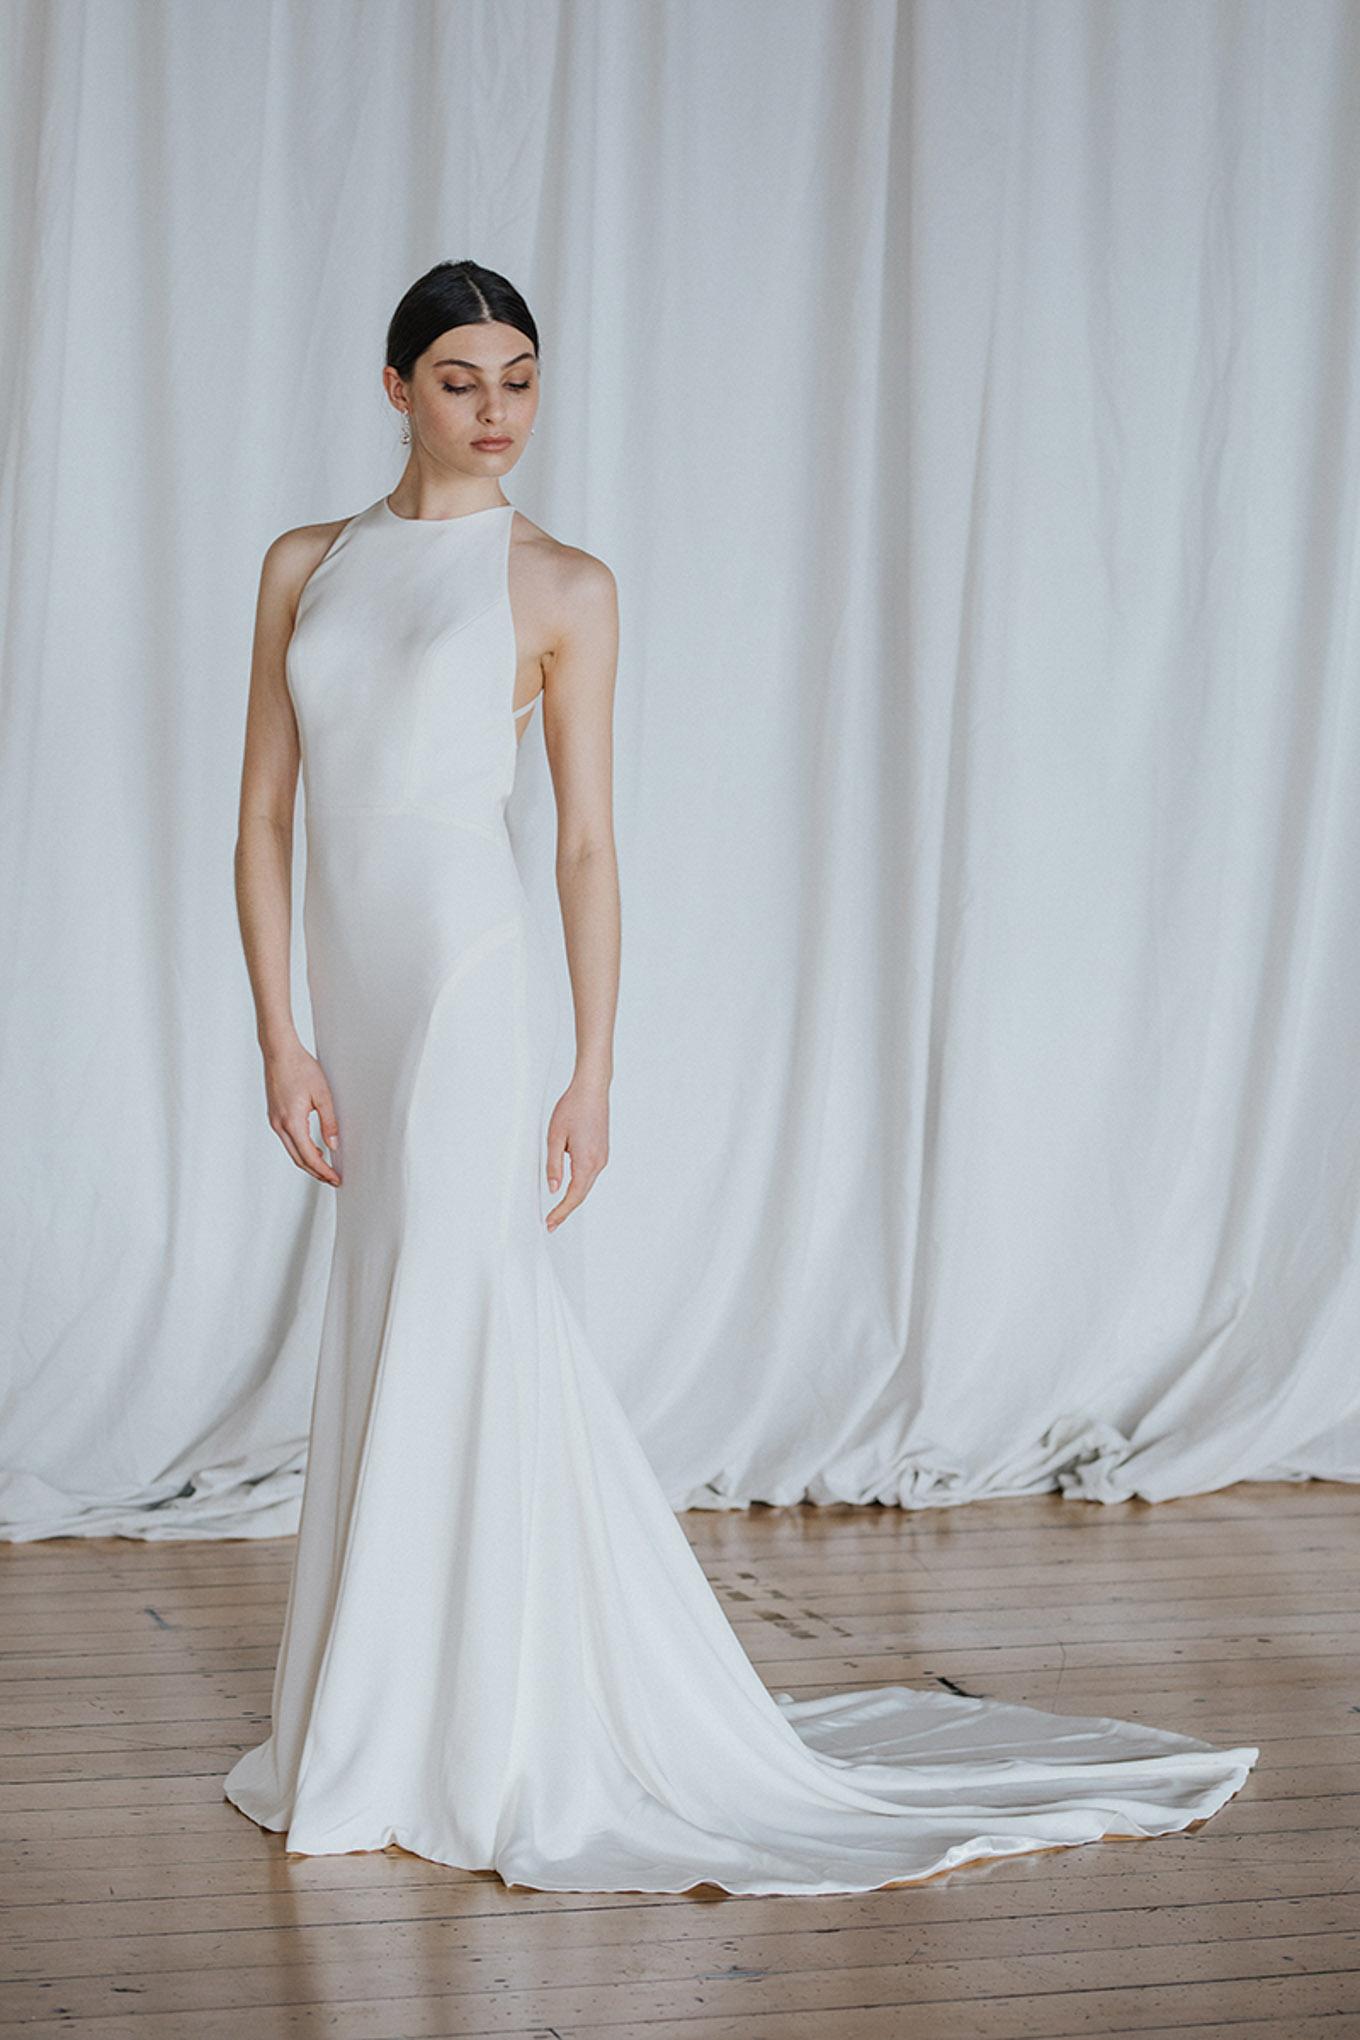 Bridal Gowns Editors Picks Together Journal